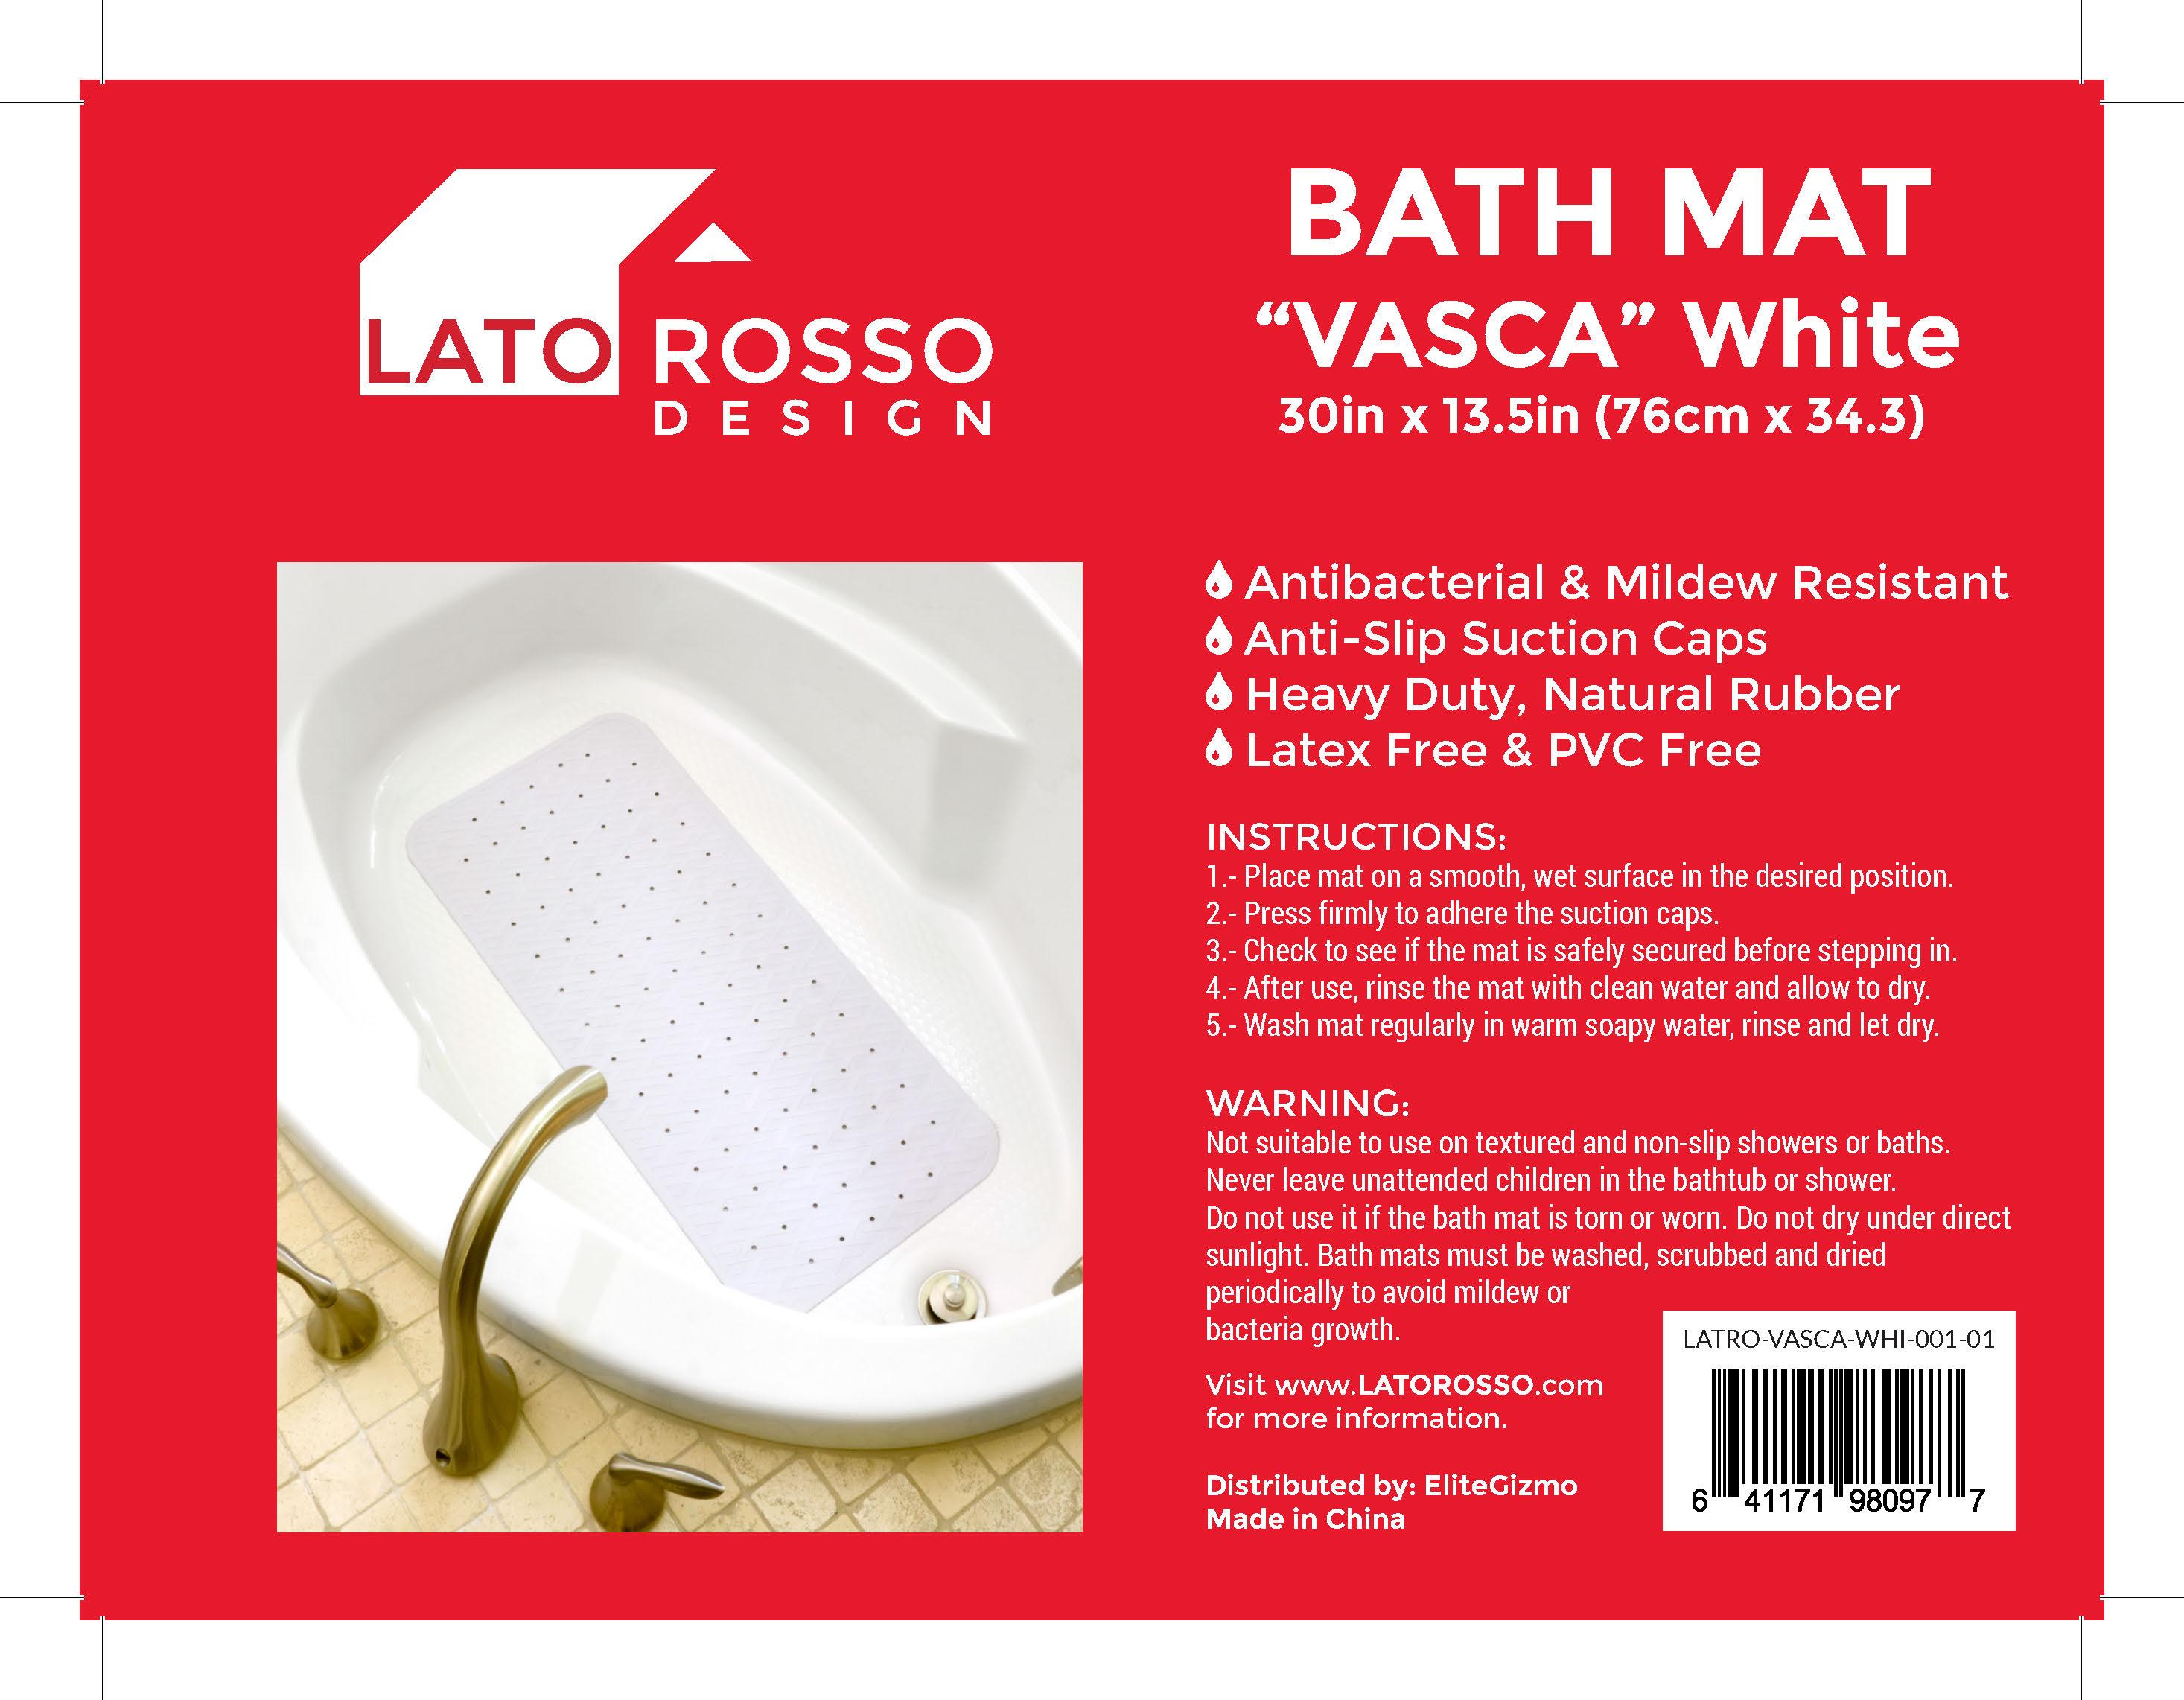 anti slip bath mat antibacterial mildew resistant top quality lato rosso bathtub mat vasca label